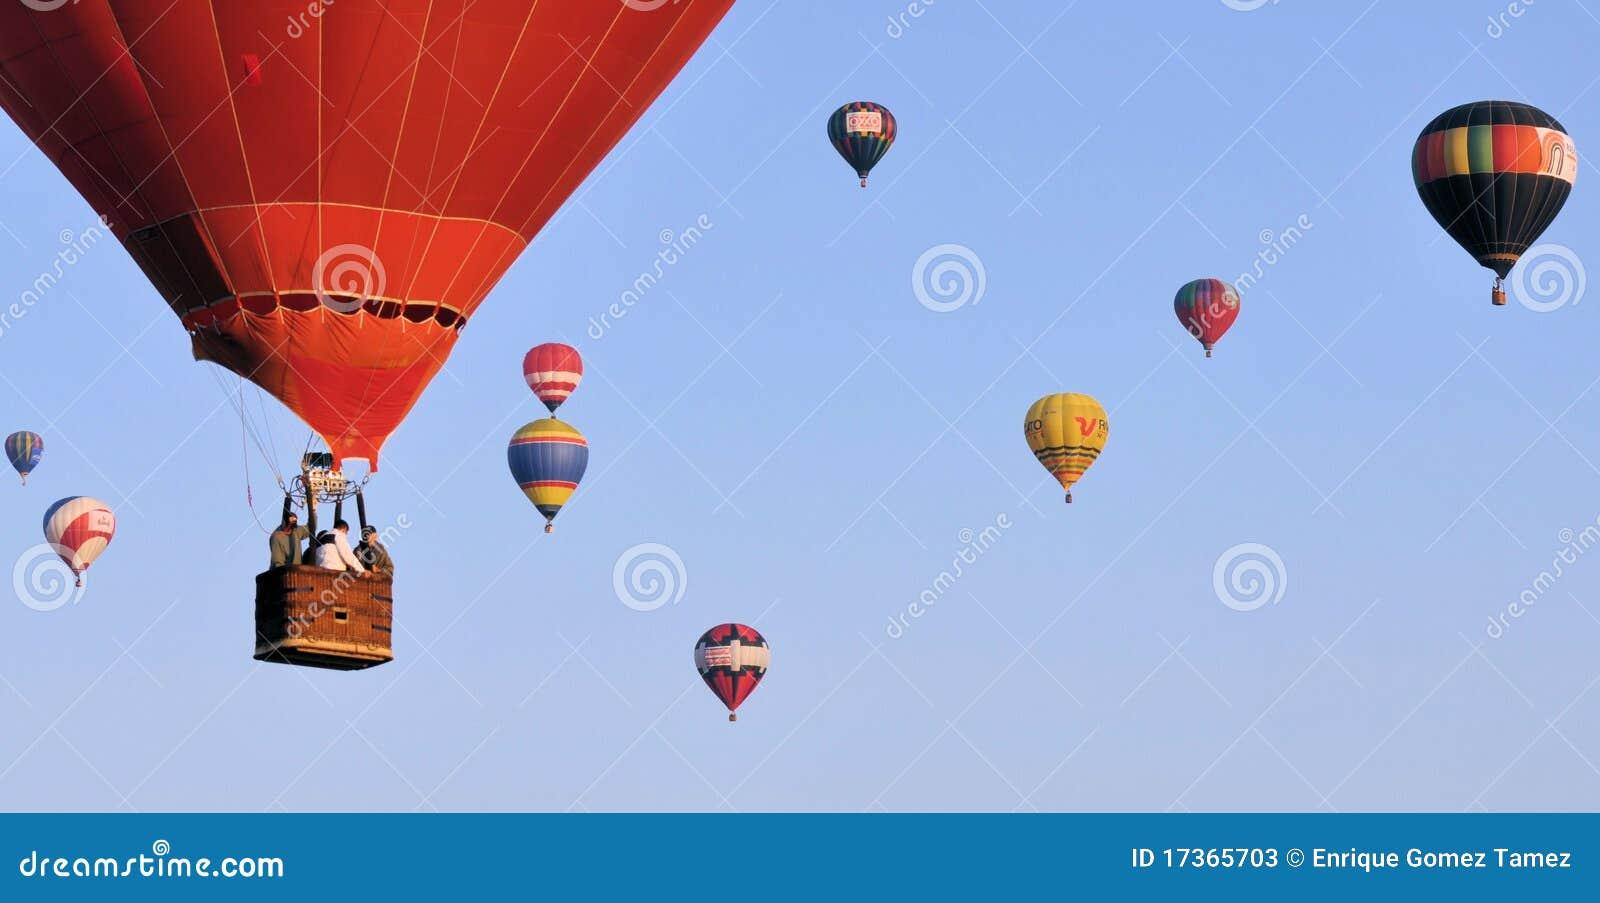 Volando su un aerostato